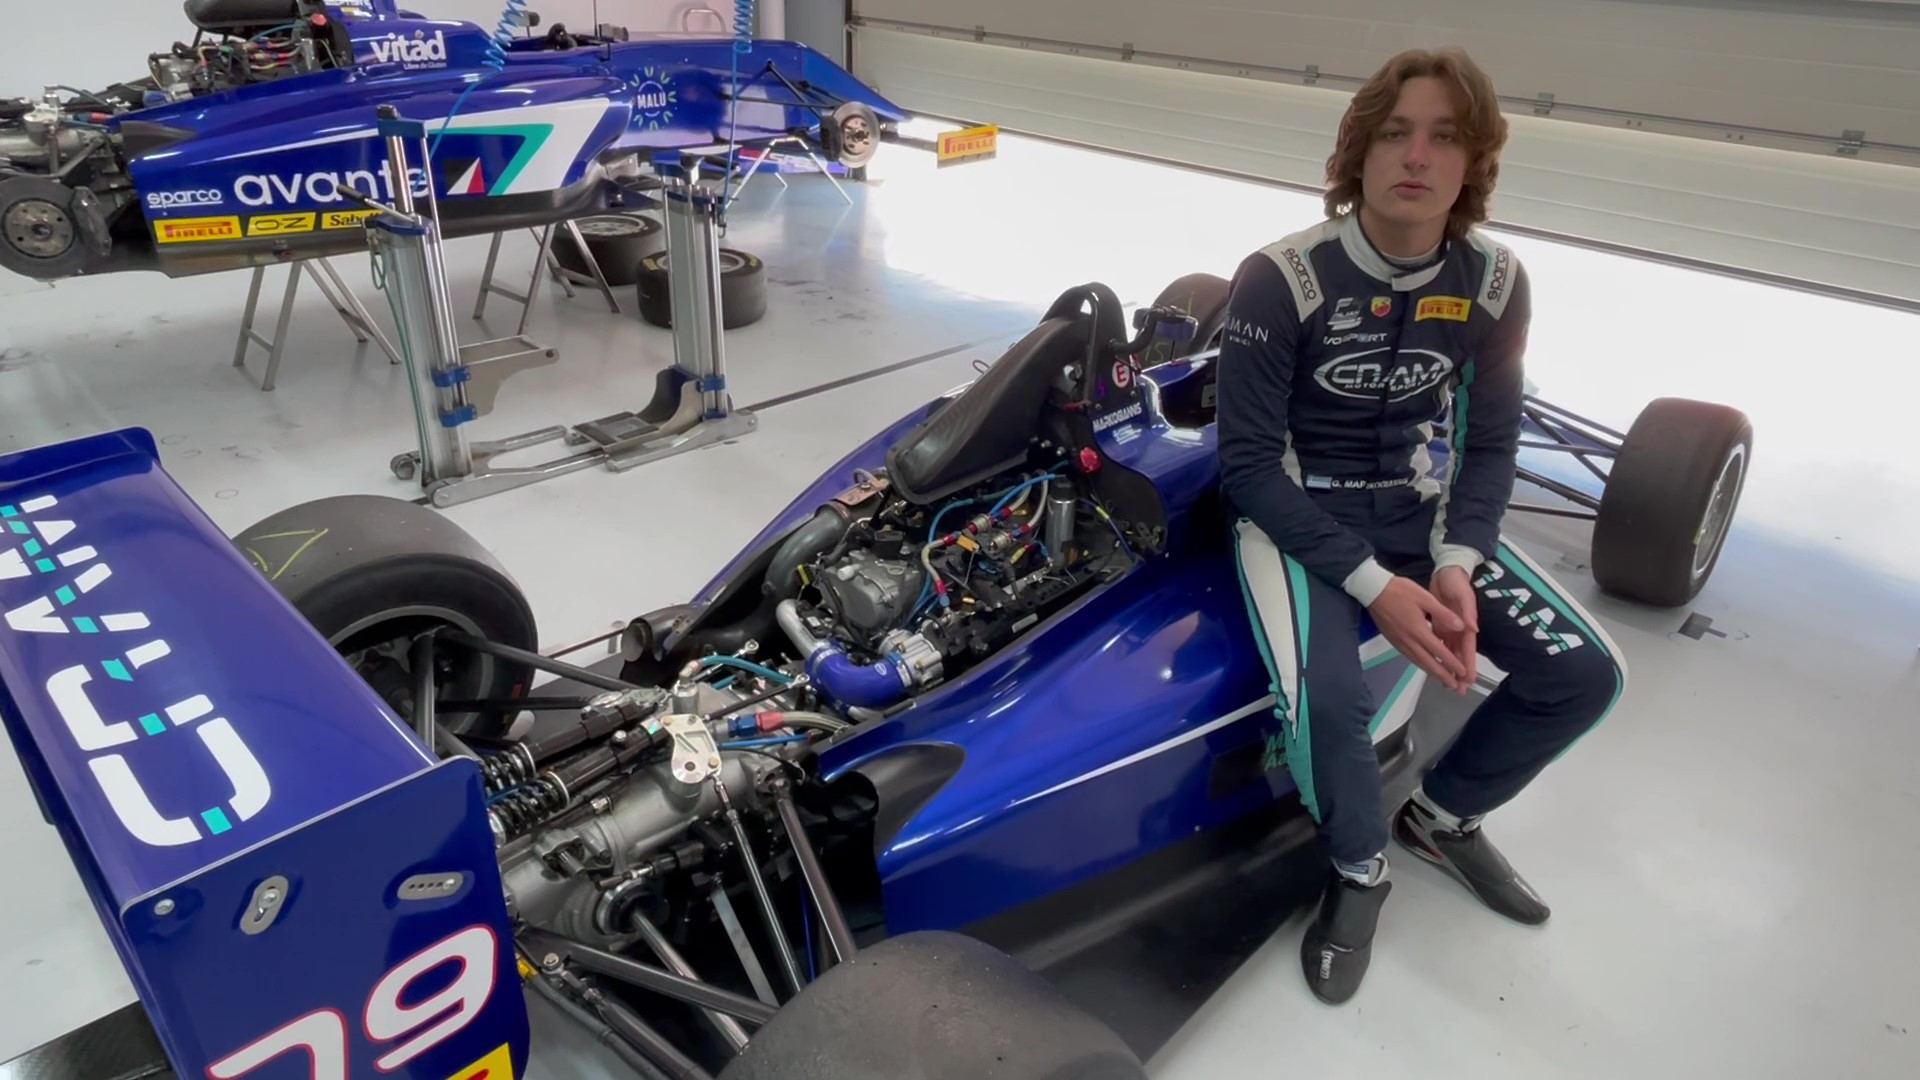 testingpaulricard0708may2021abarth2 609d01090fb0a H Ιταλική Formula 4, συνεχίζει στη Vallelunga Abarth, Formula 4, αγωνες, ειδήσεις, Νέα